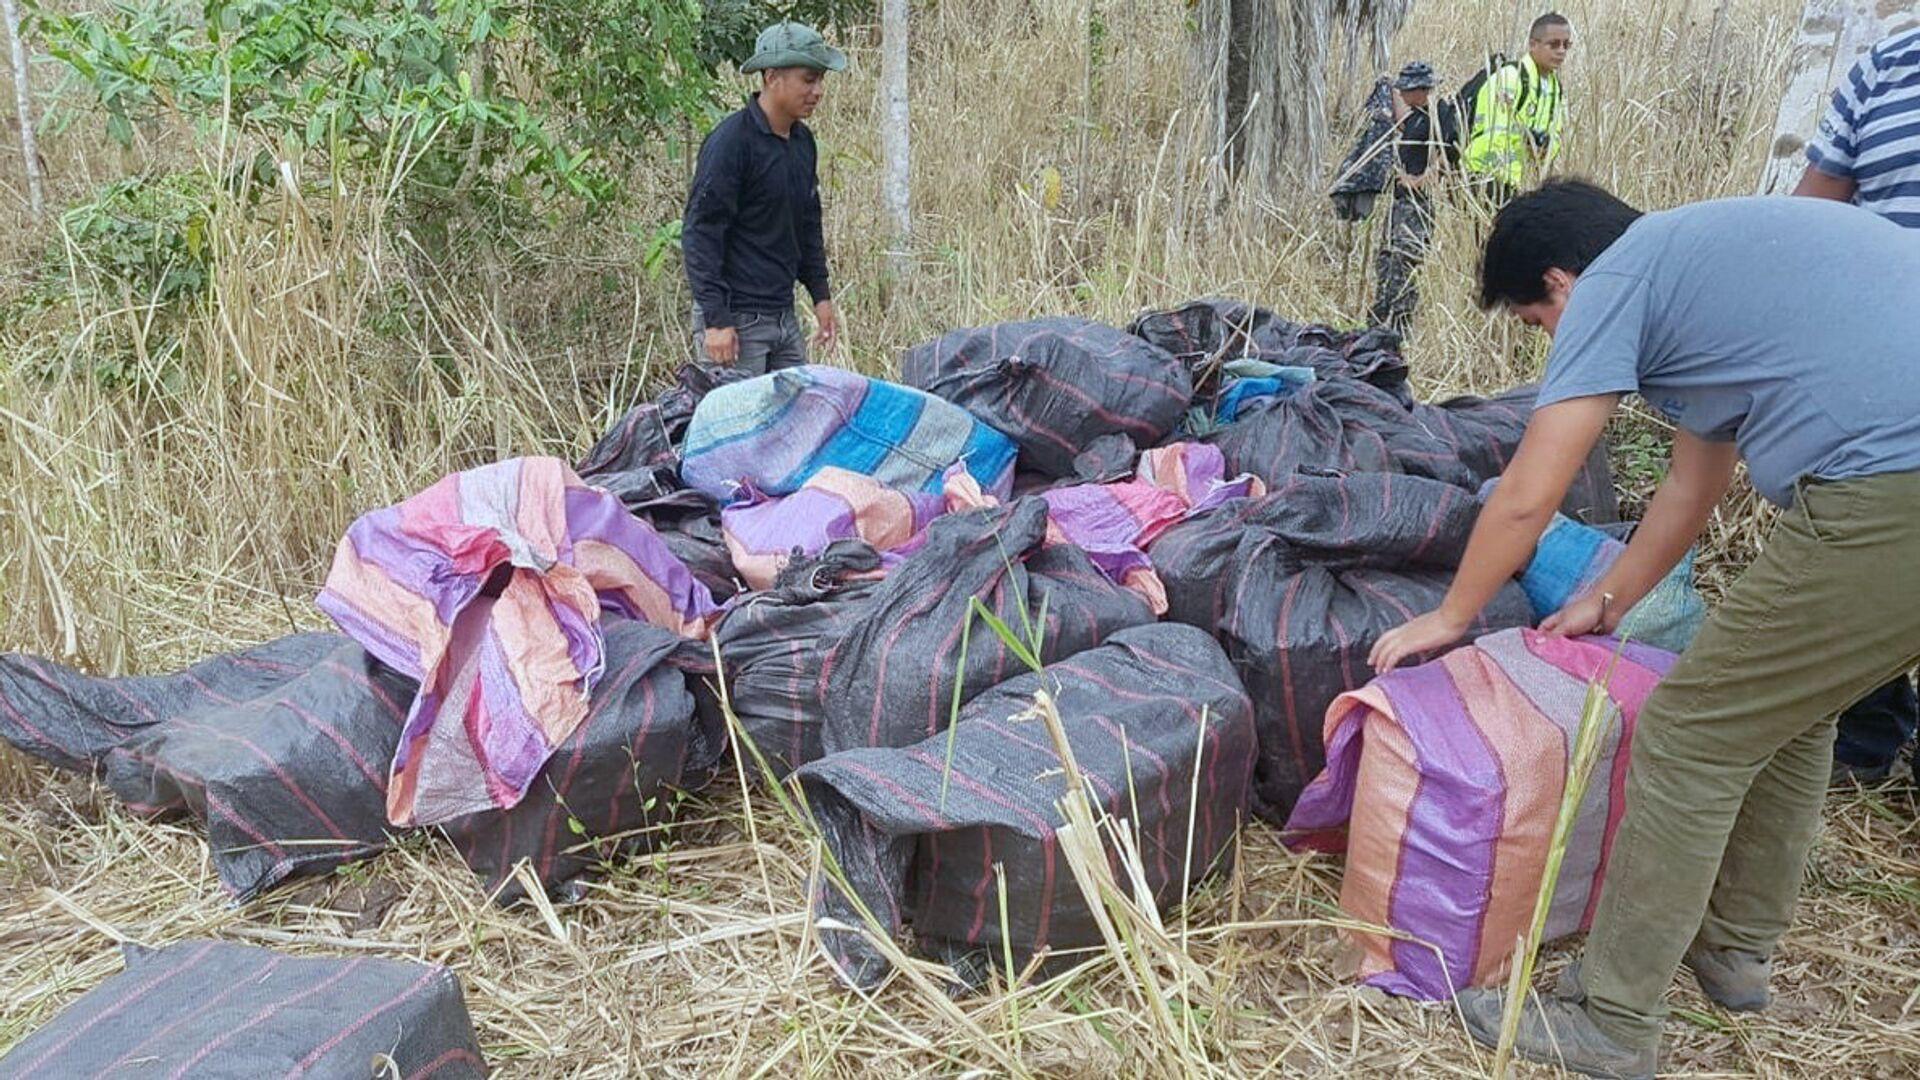 Сотрудники прокуратуры и полиции Эквадора во время изъятия двух с половиной тонн кокаина в провинции Манаби. 29 ноября 2018 - РИА Новости, 1920, 28.07.2021